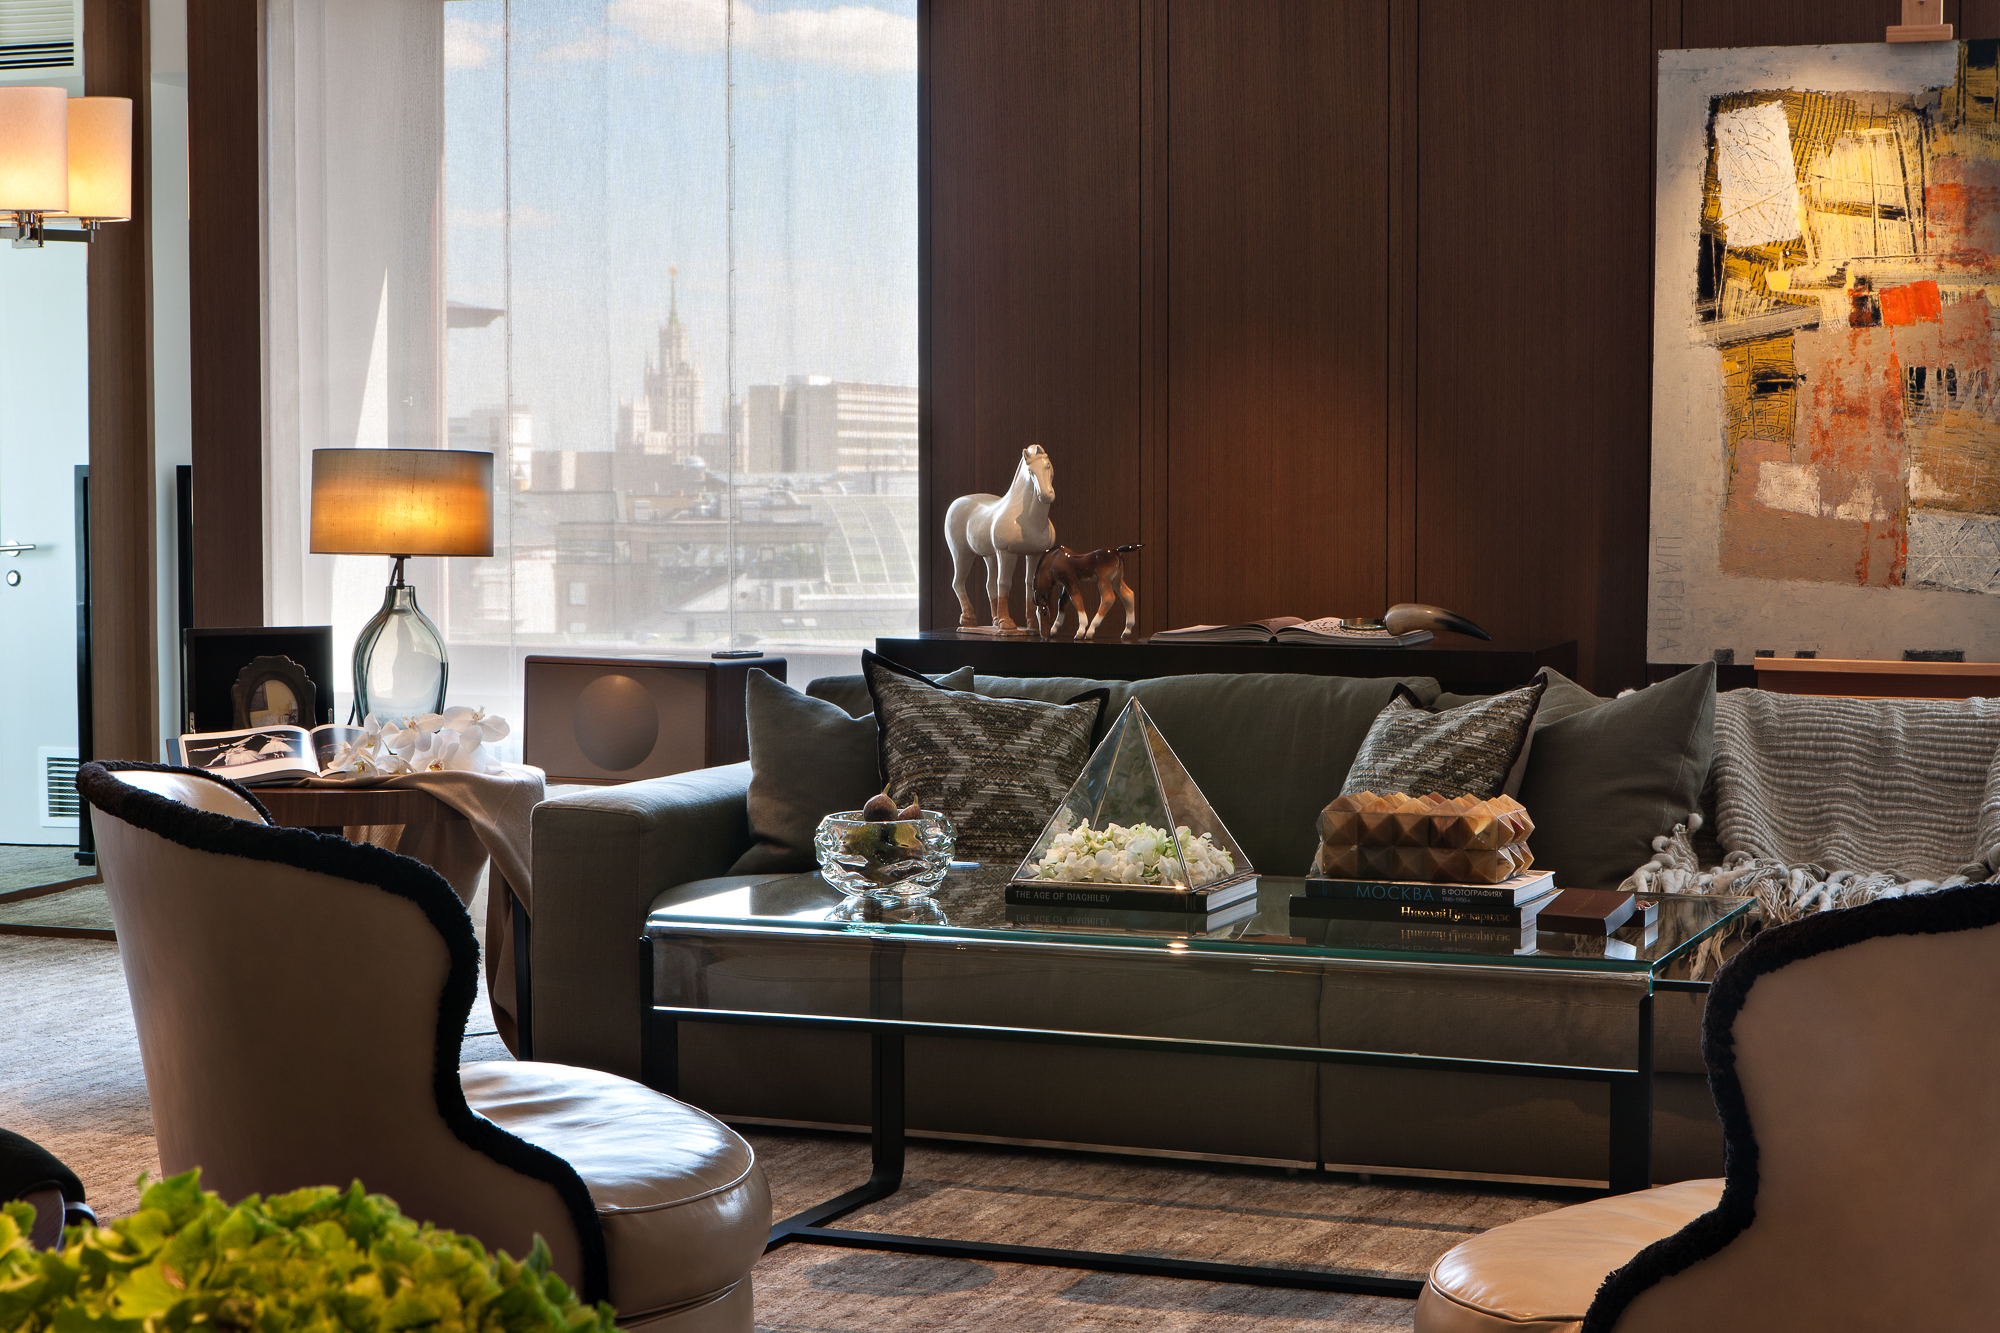 Ararat-Park-Hyatt-Moscow-Penthouse-Living-Room-Decor.jpg